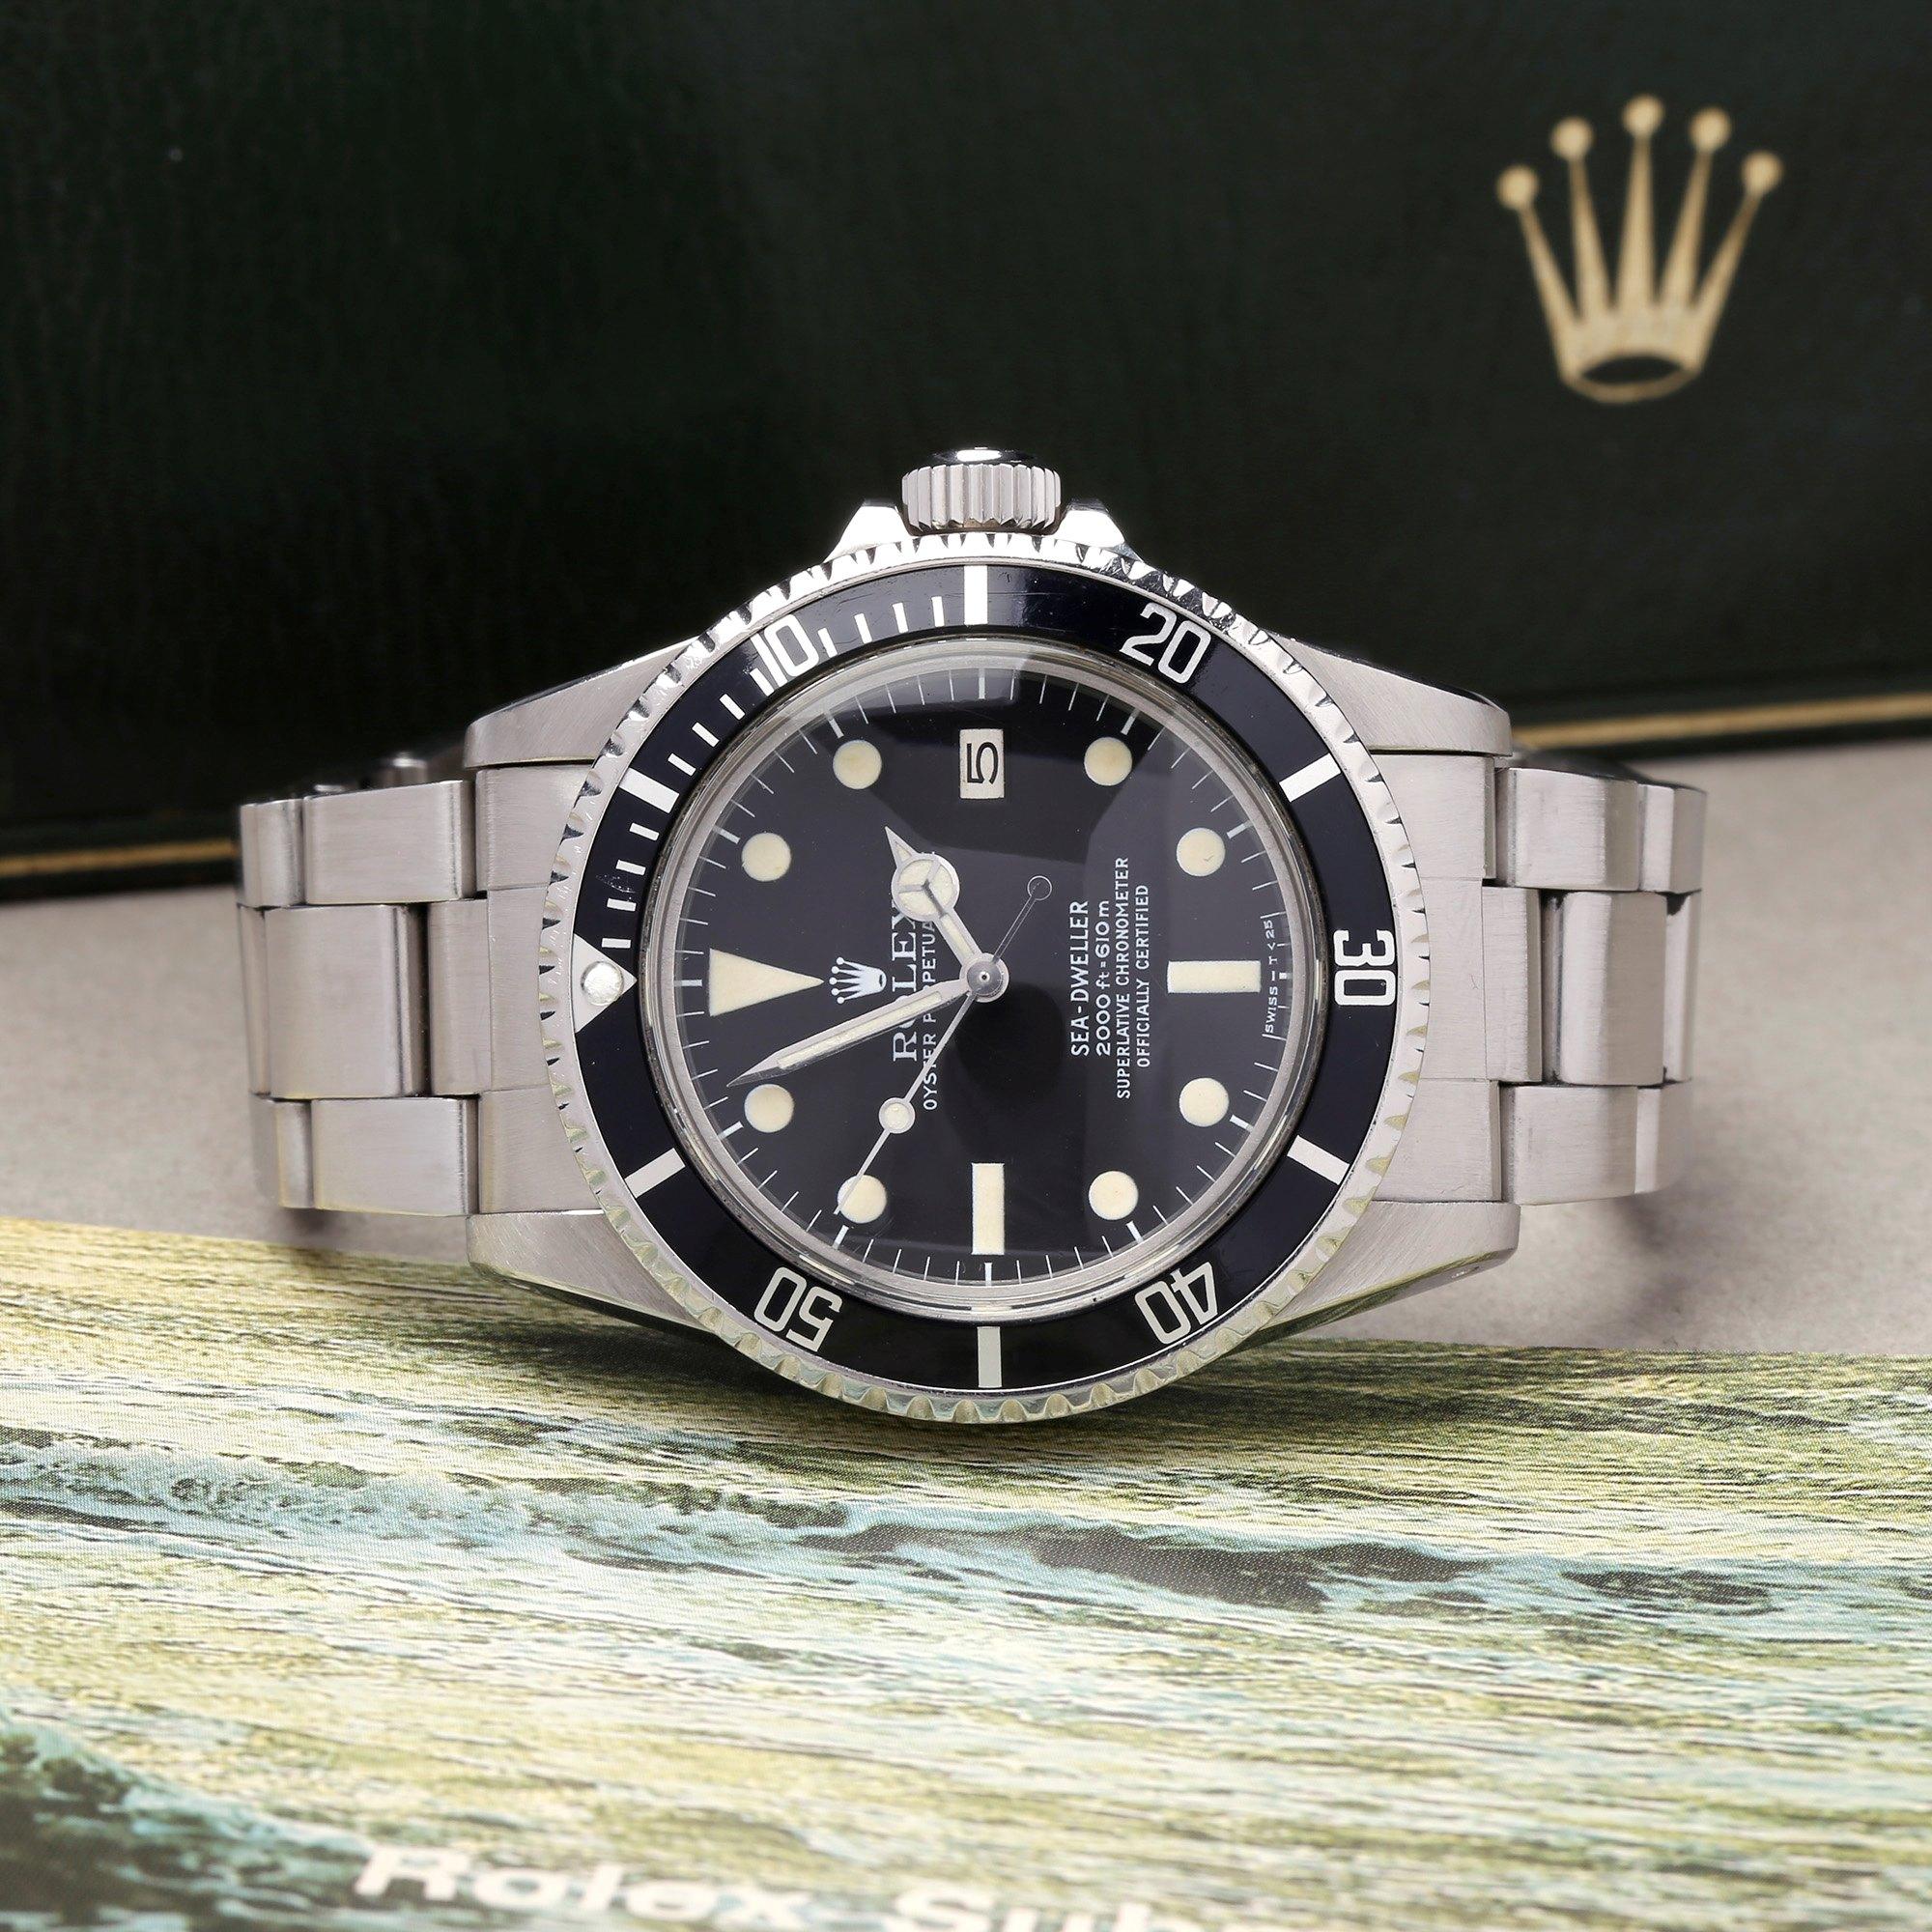 Rolex Sea-Dweller MK1 Dial Stainless Steel 1665